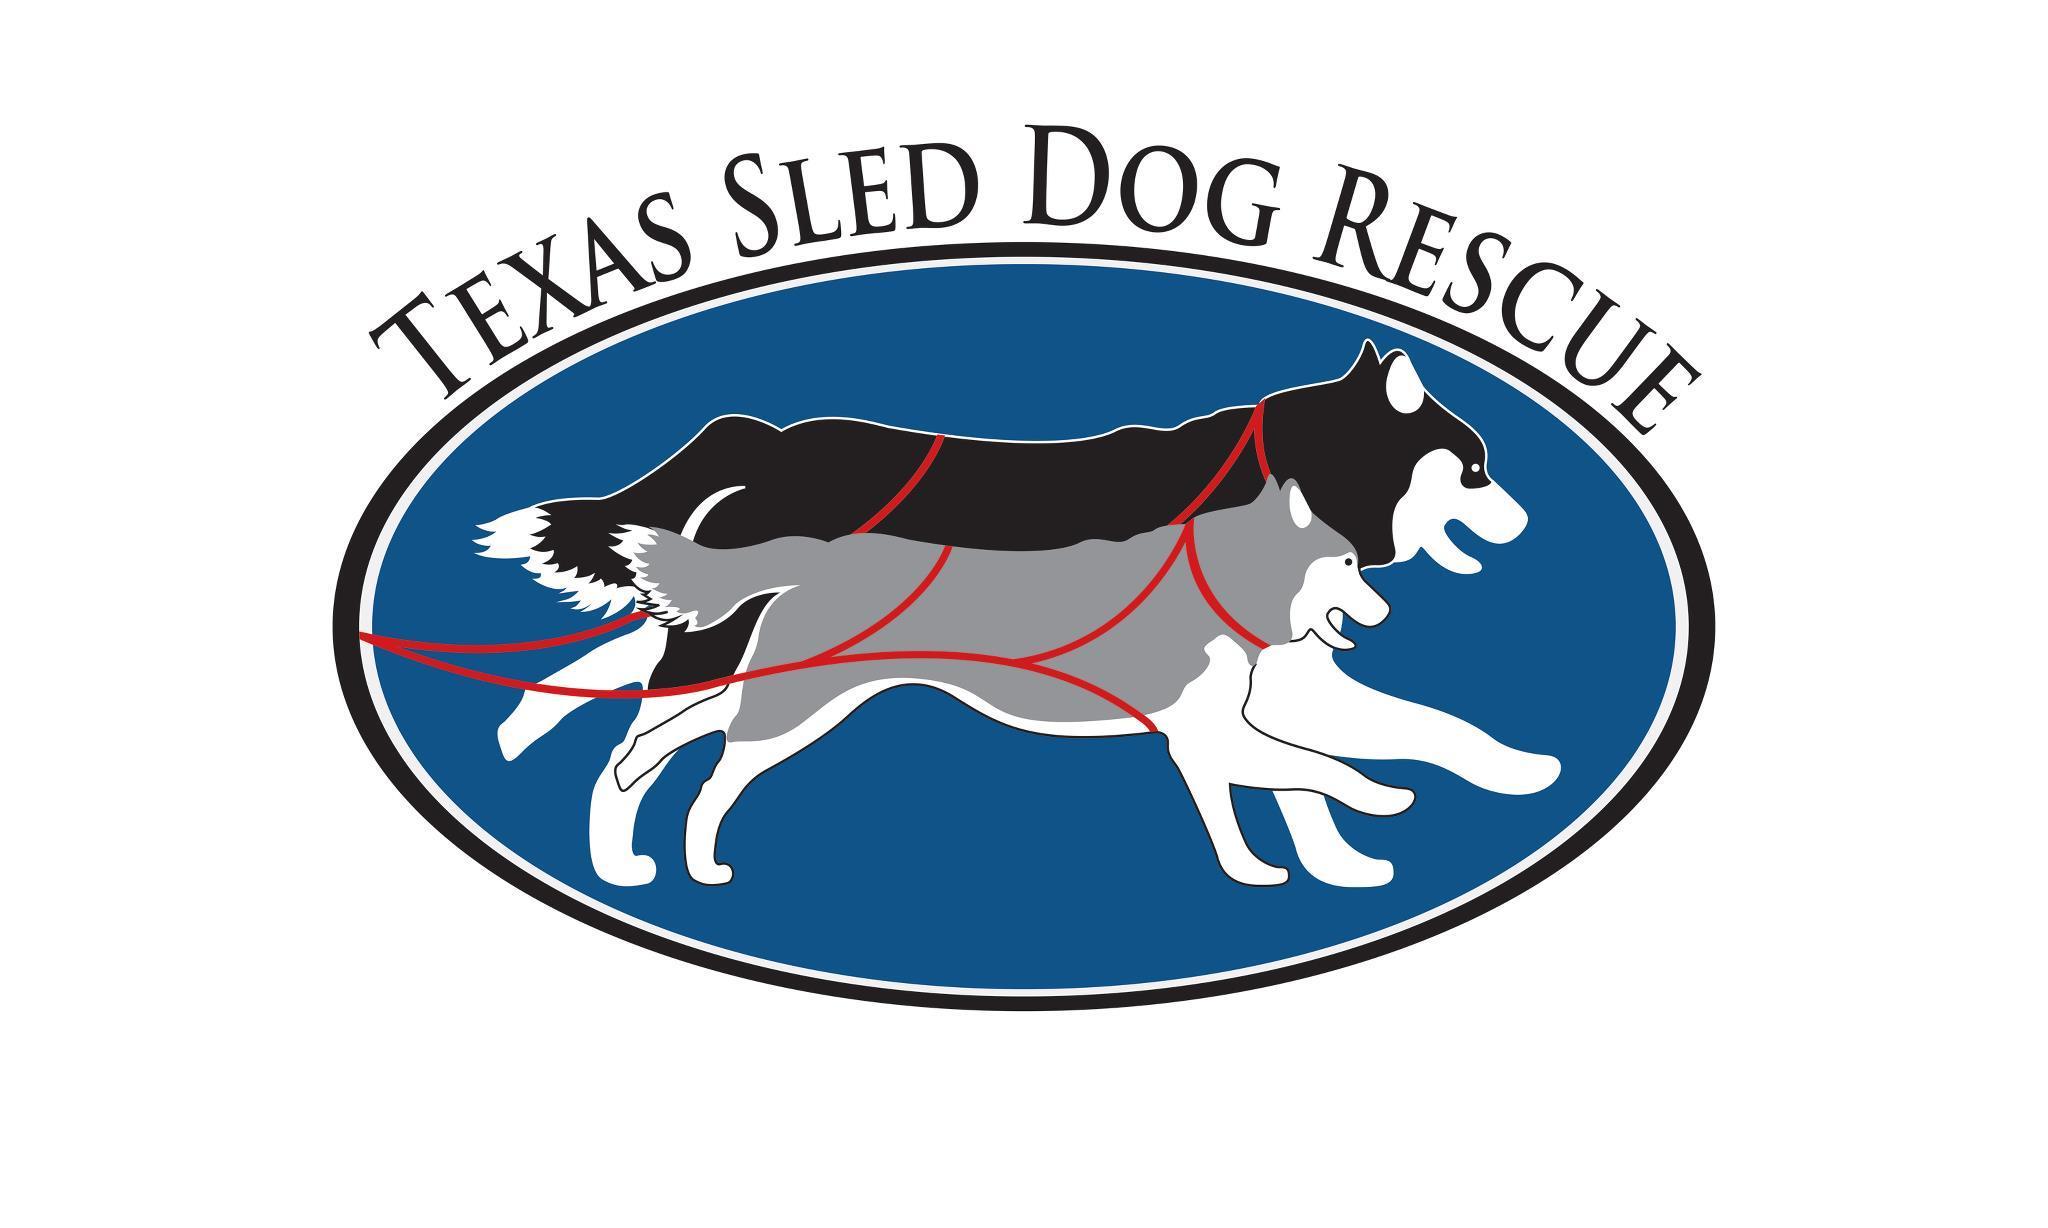 Texas Sled Dog Rescue